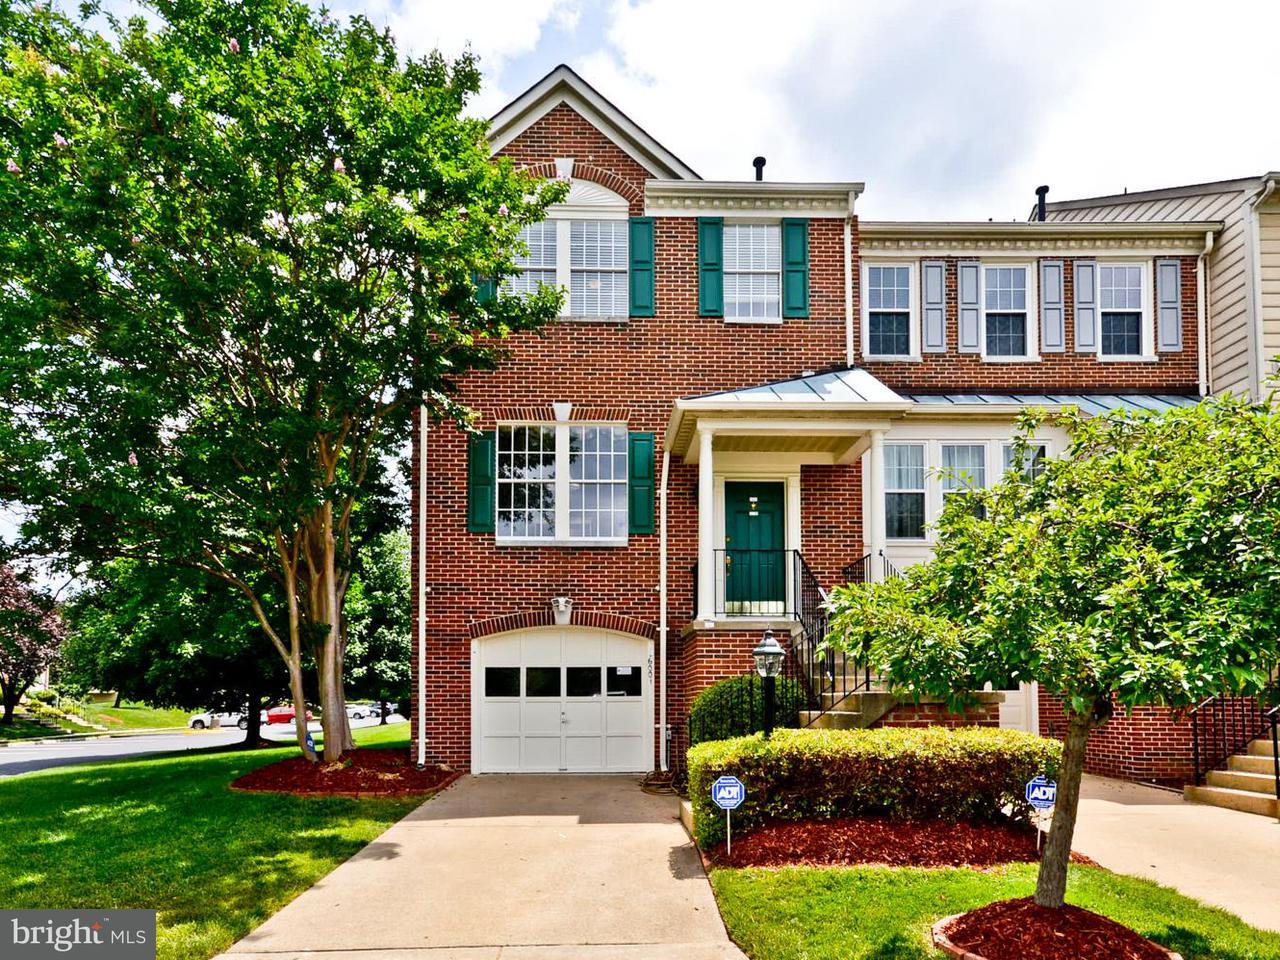 Townhouse for Sale at 6001 KESTNER Circle 6001 KESTNER Circle Alexandria, Virginia 22315 United States